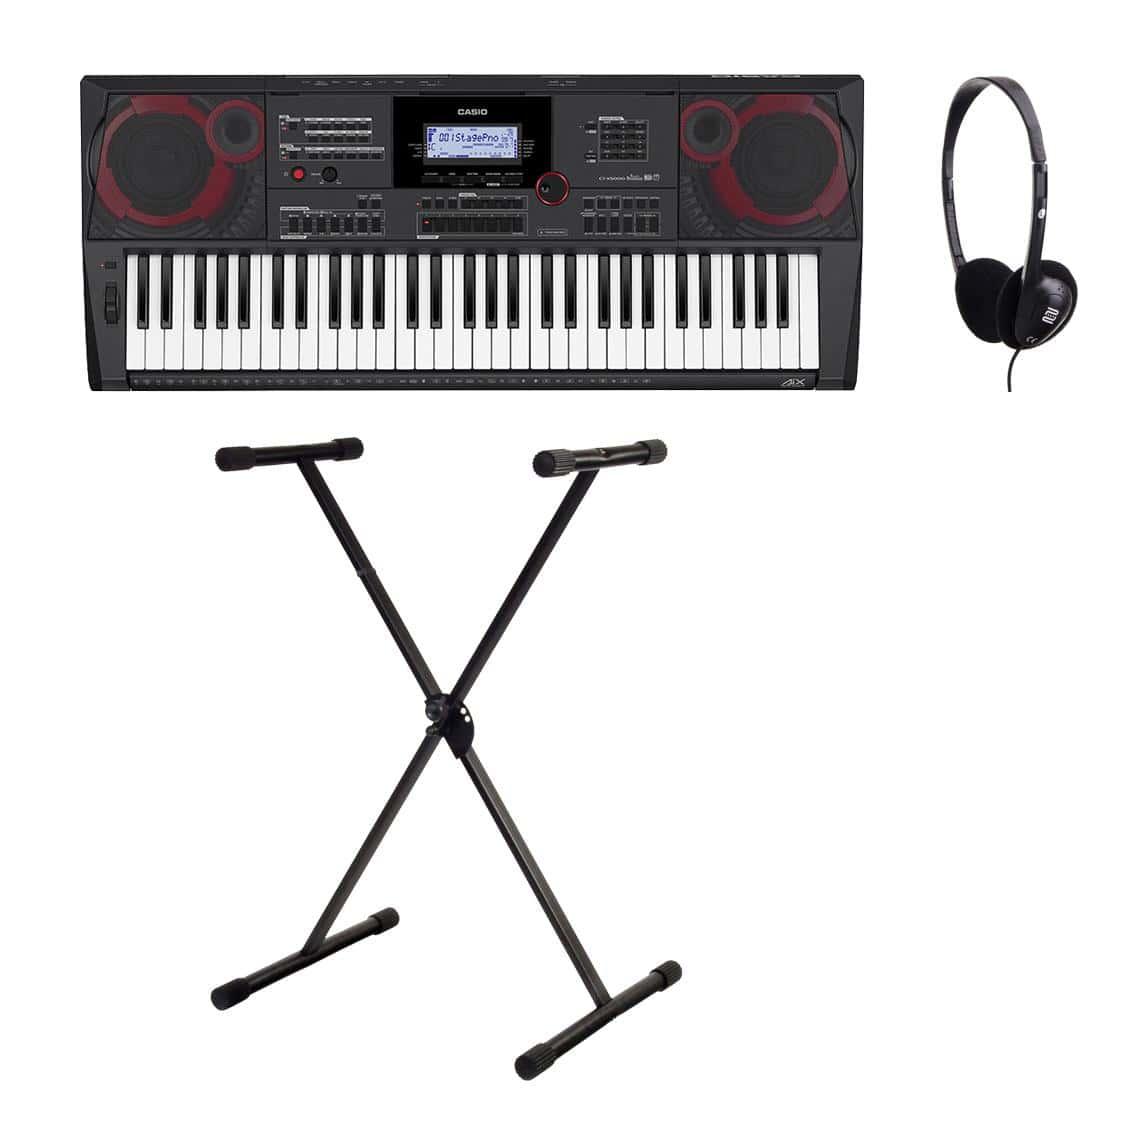 Casio CT X5000 Midi Keyboard Set inkl. Keyboardständer Kopfhörer